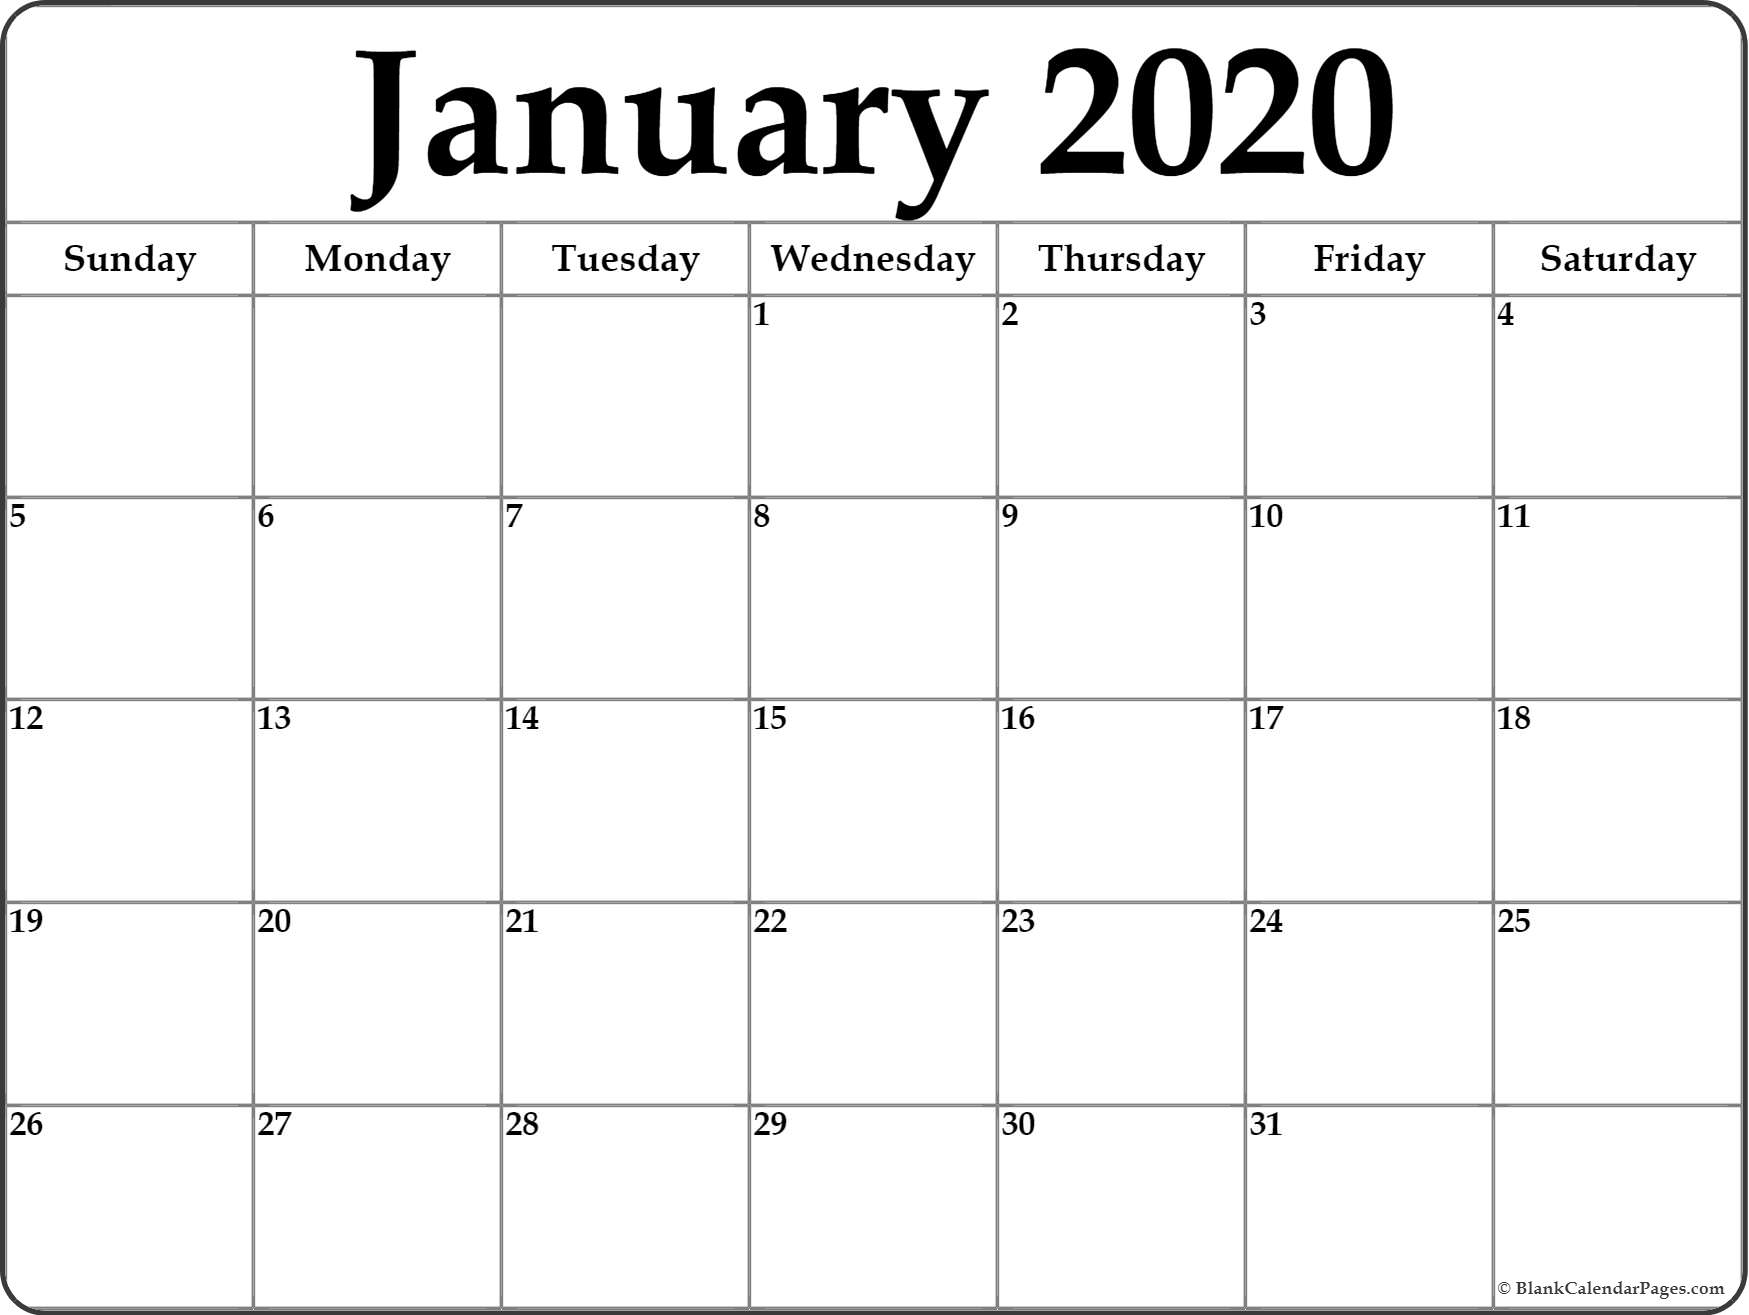 Https://idlewildfurnishing/pretty-Monthly-Calendar-2020